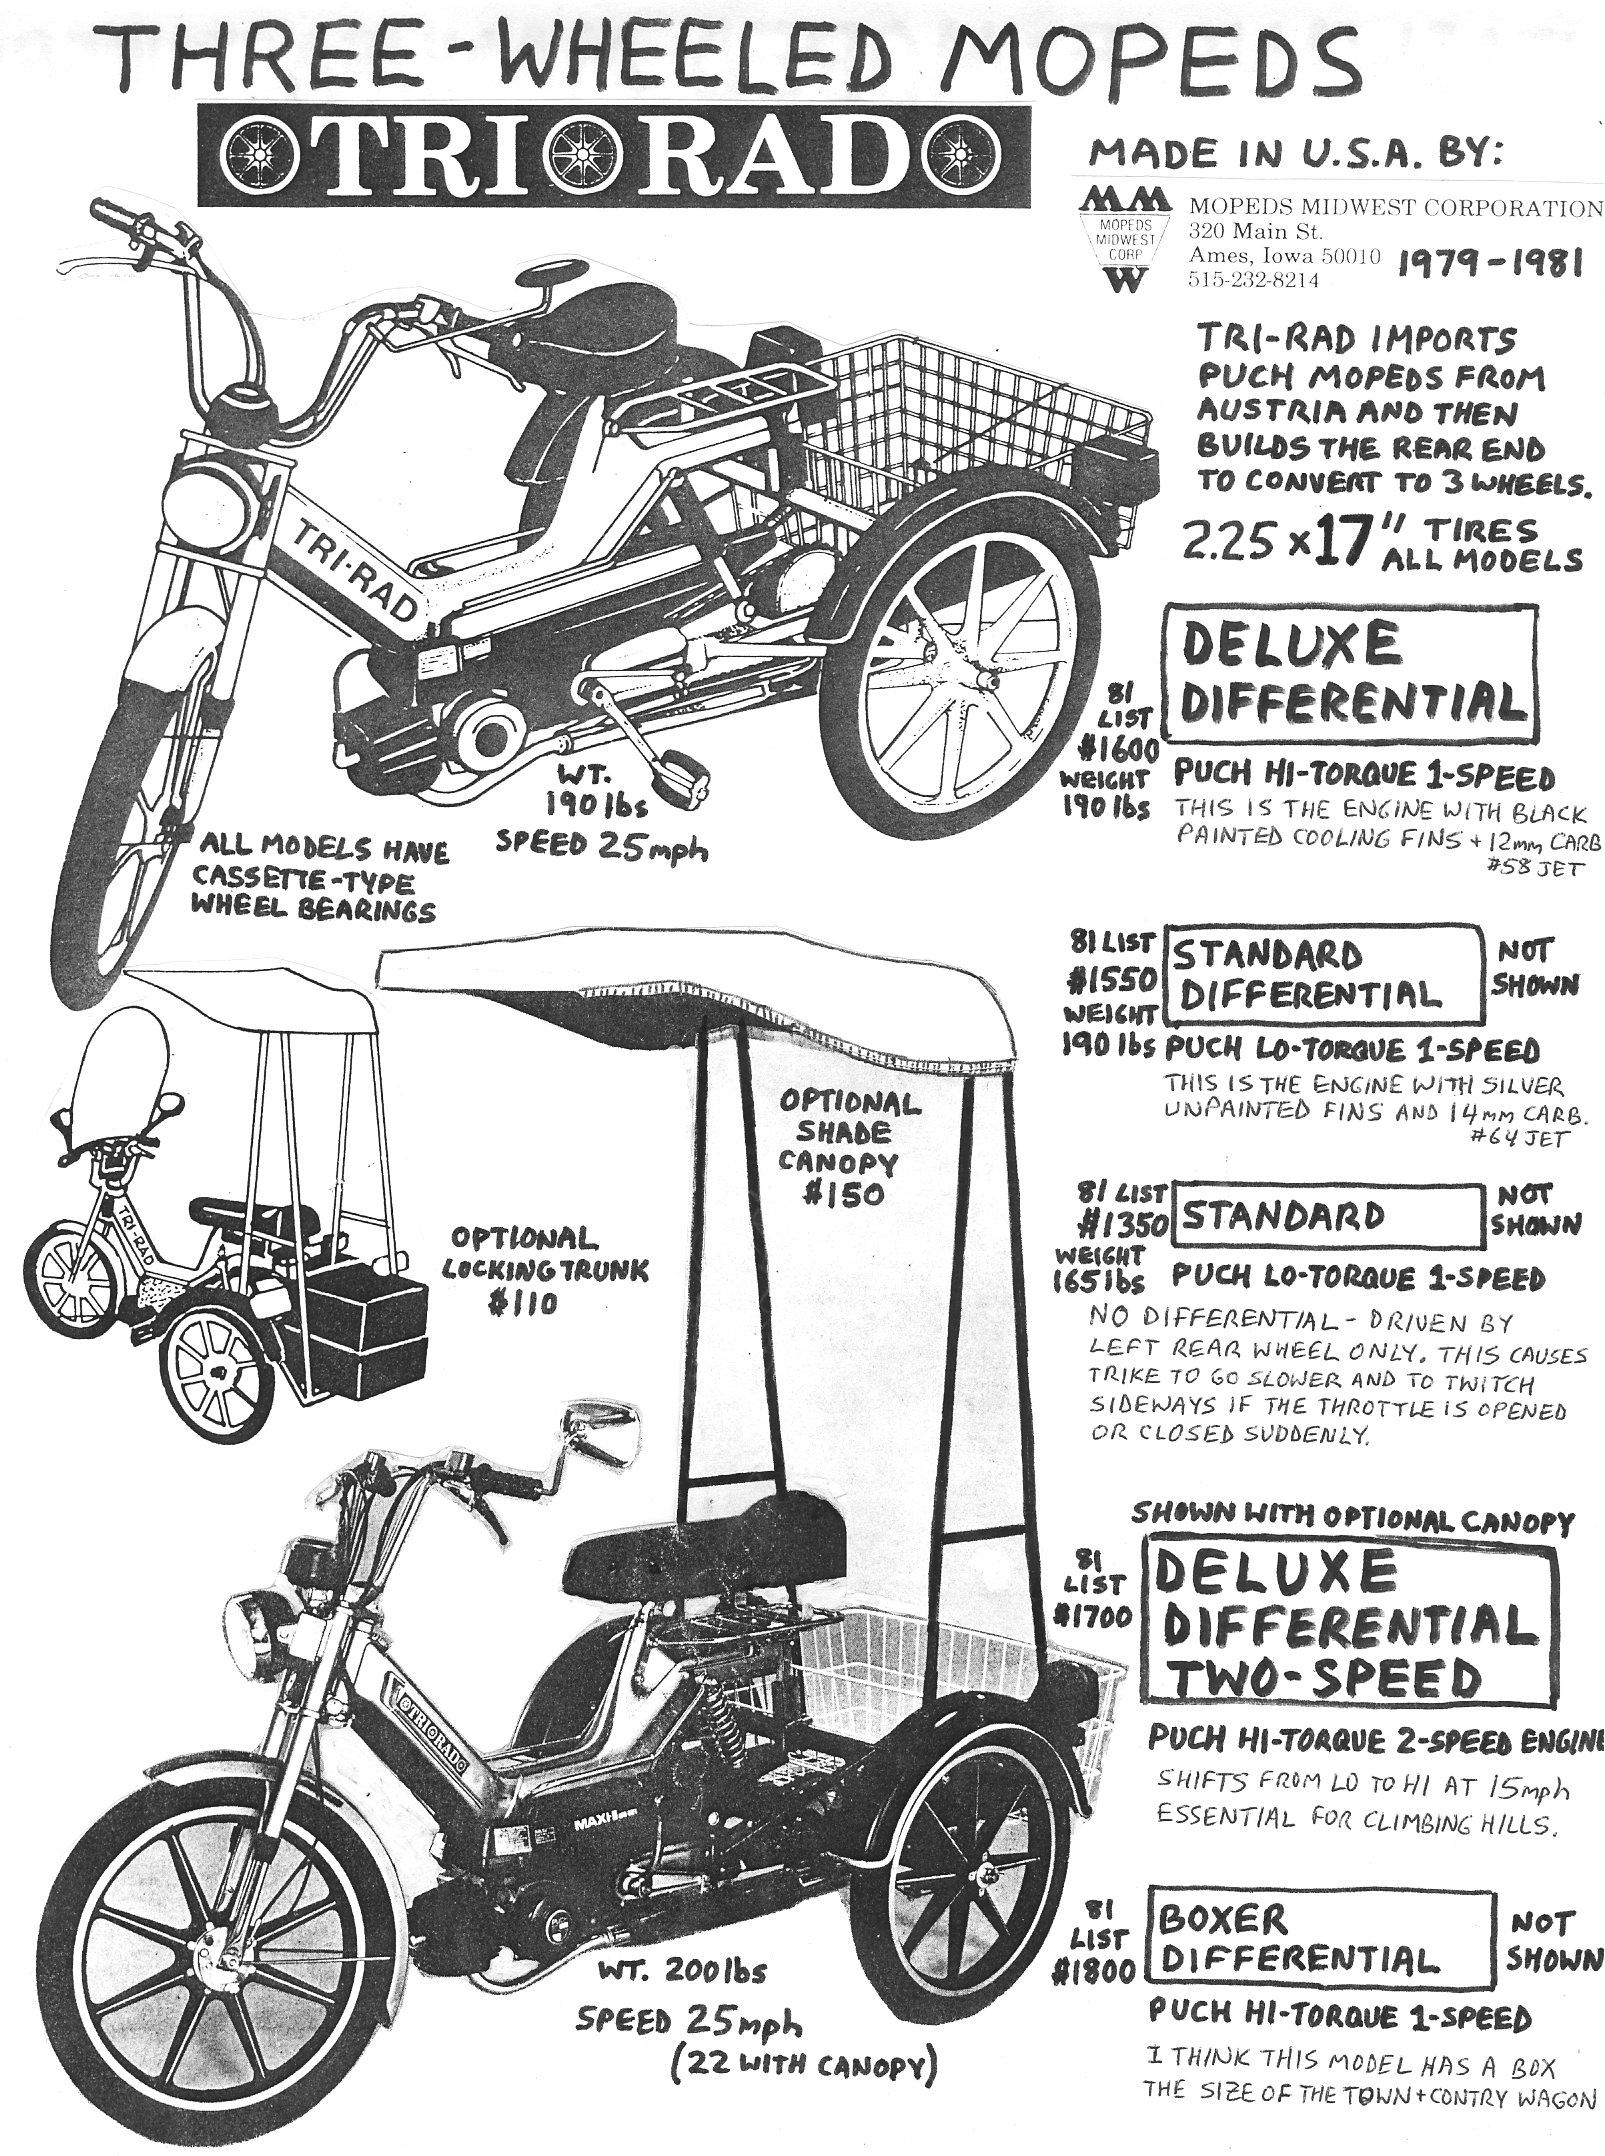 taotao 49cc scooter wiring diagram 2006 ford mustang v6 fuse box vip 50cc imageresizertool com